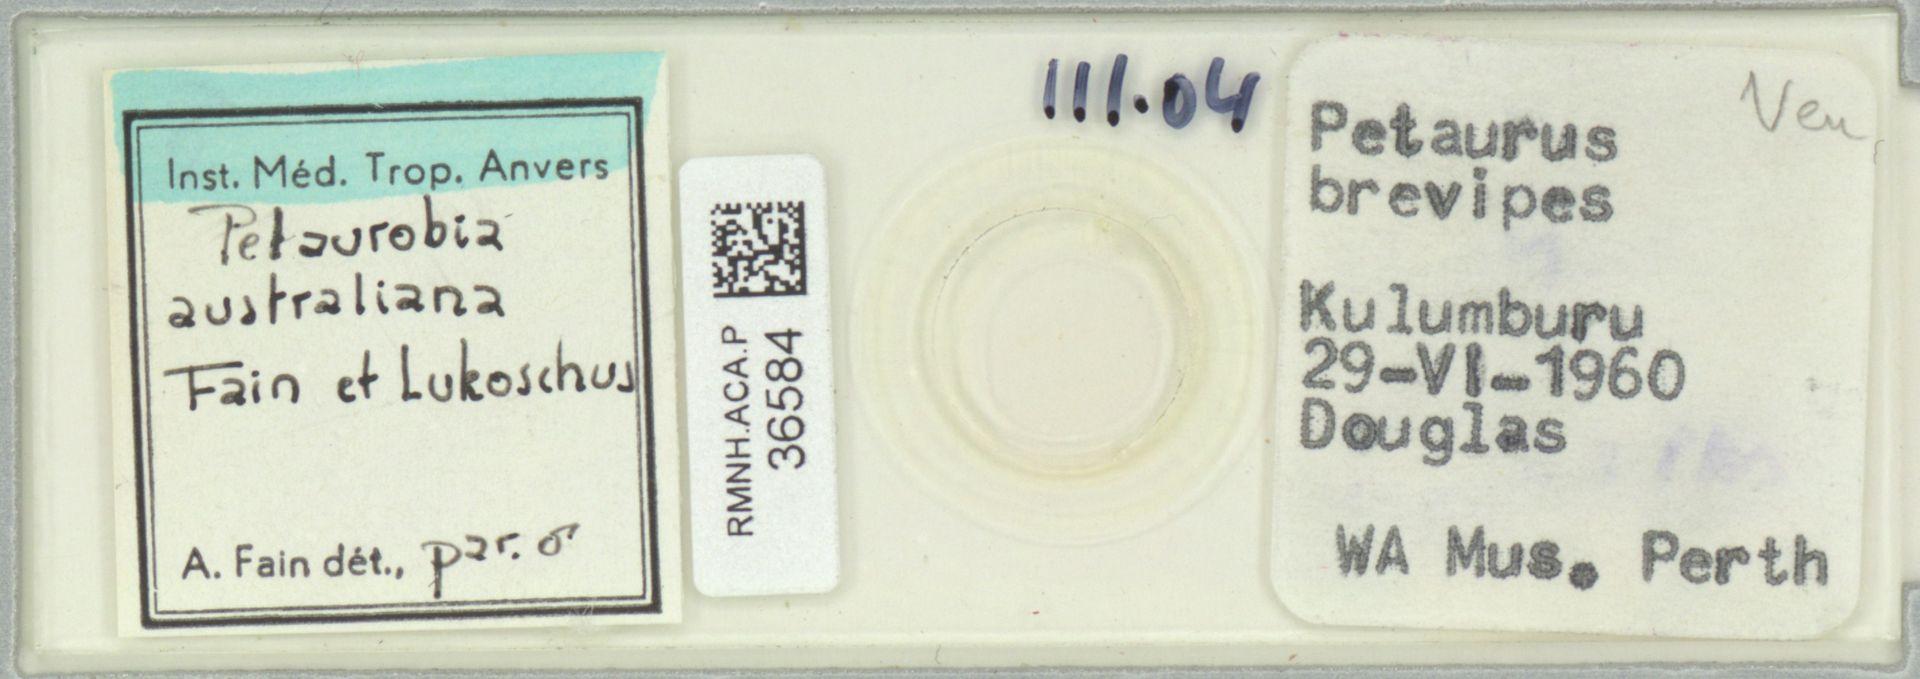 RMNH.ACA.P.36584   Petaurobia australiana Fain et Lukoschus